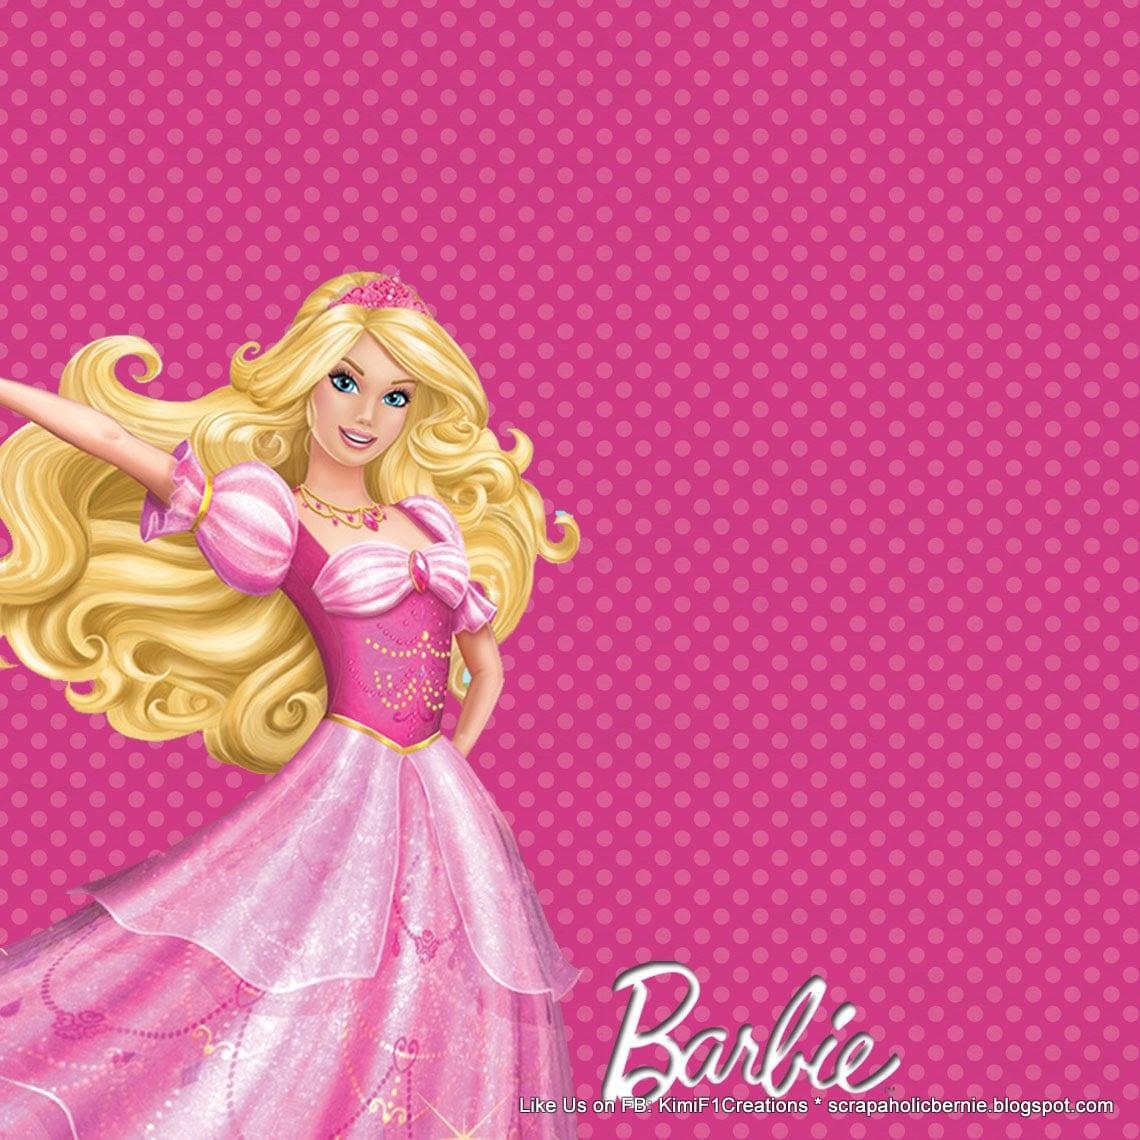 Barbie Invitation Template Blank  About Barbie Invitations On